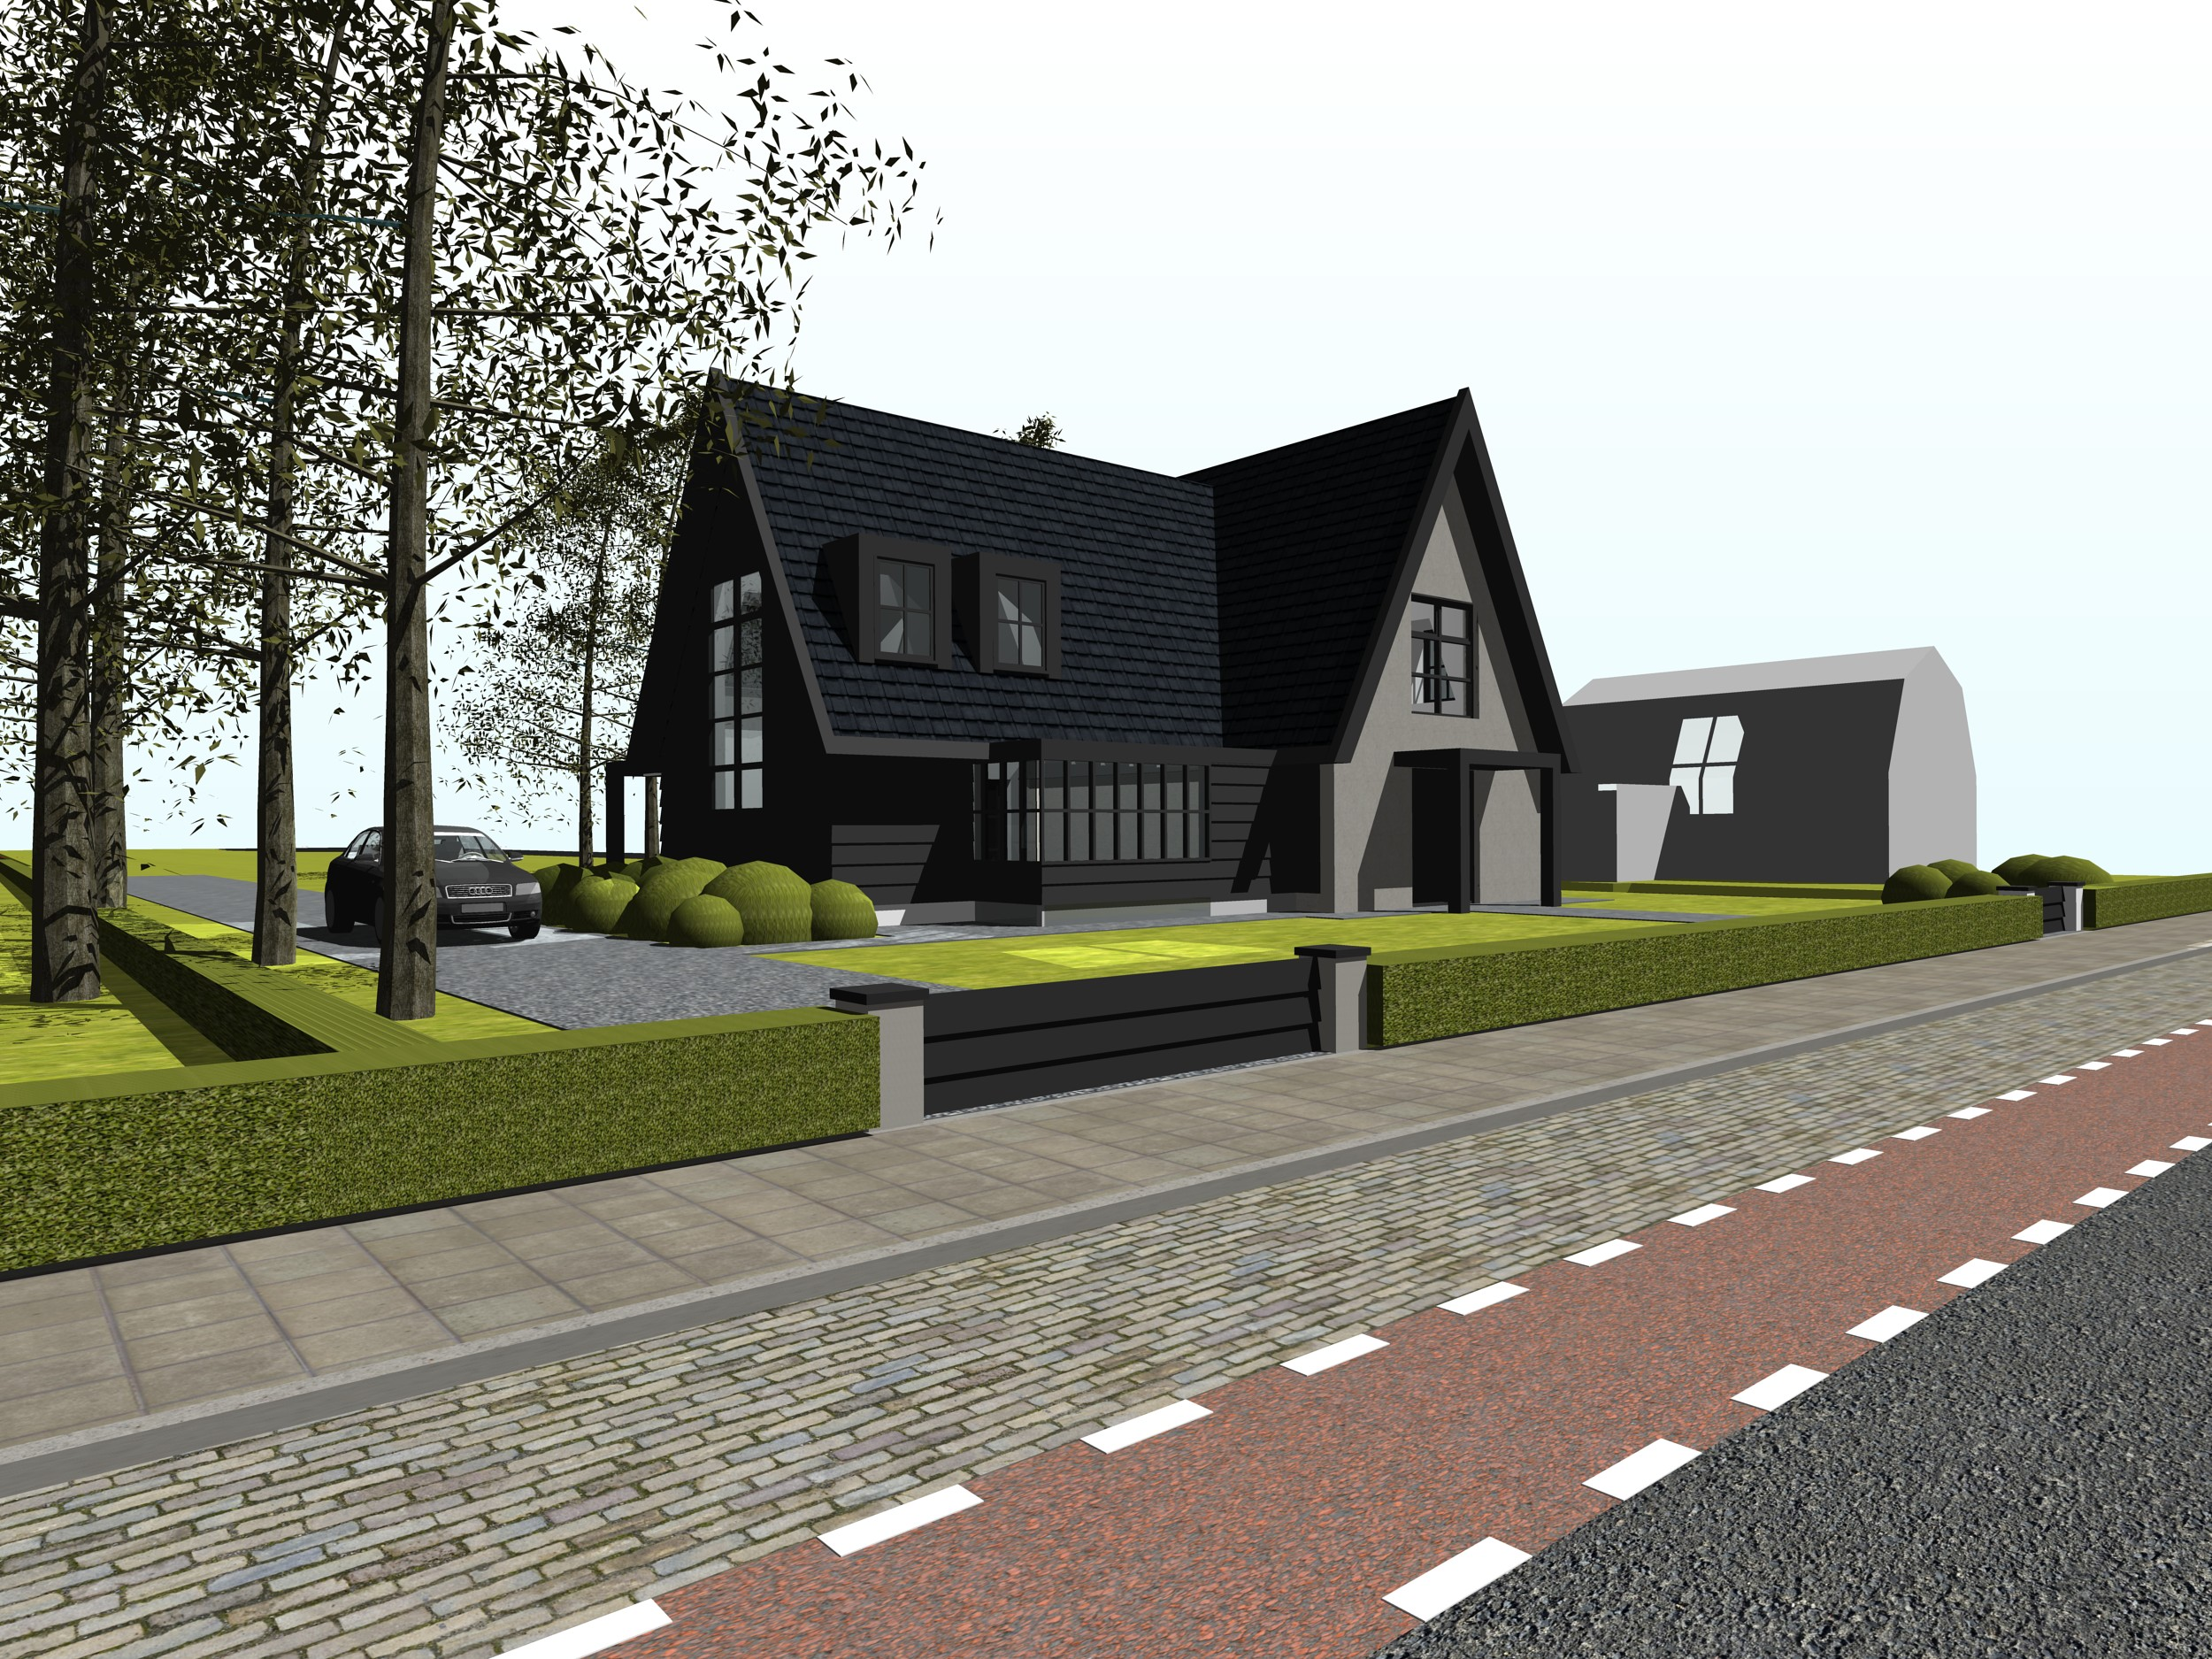 Moderne architectuur woonhuizen sur88 agneswamu for Moderne villa architectuur